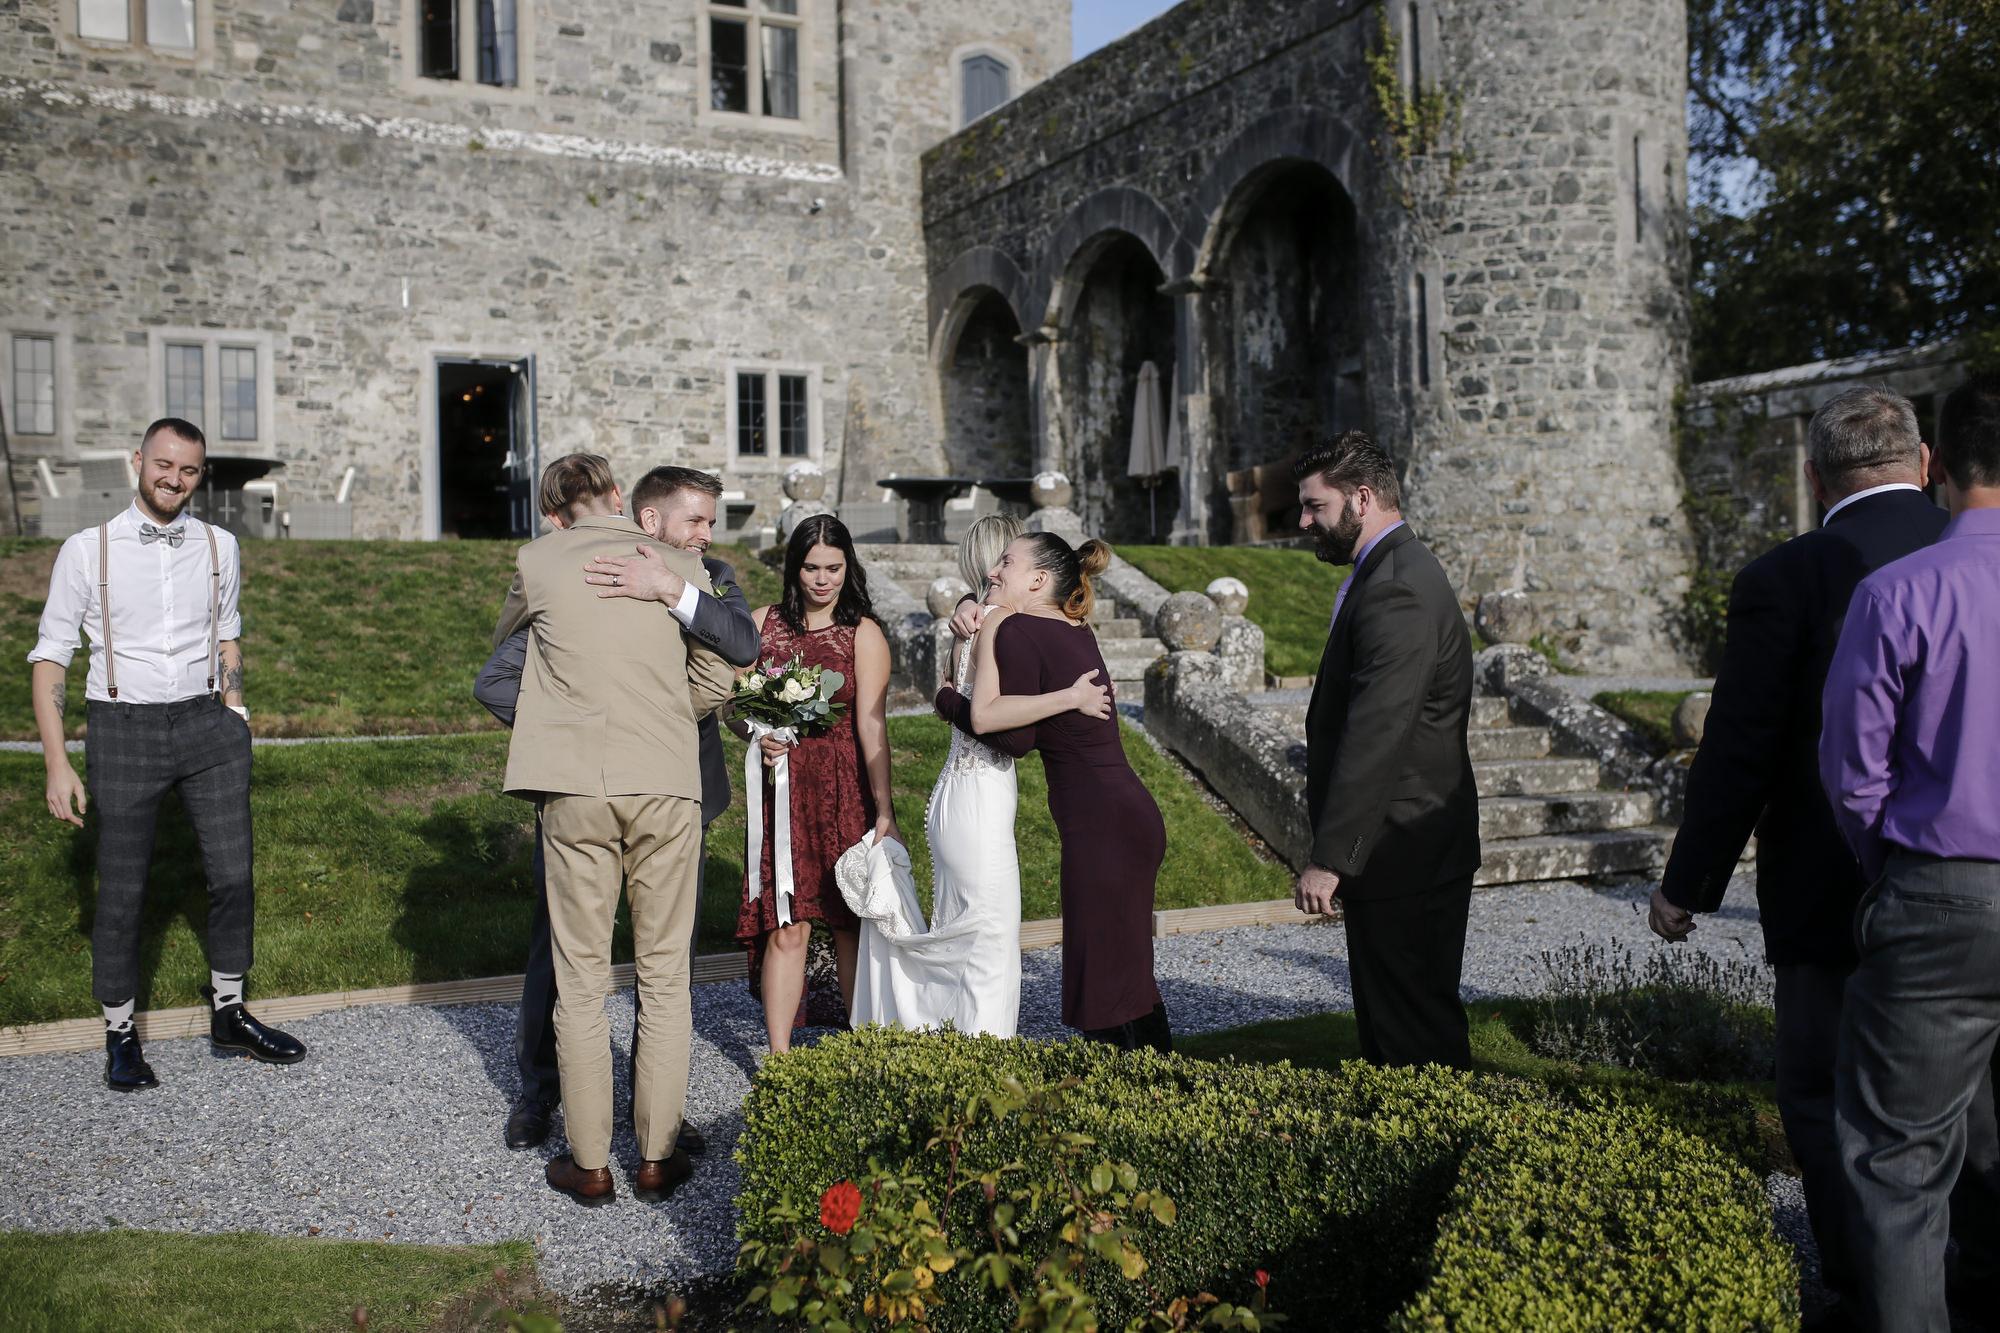 kilkea_castle_wedding_photographer_goldenmoments_033.jpg